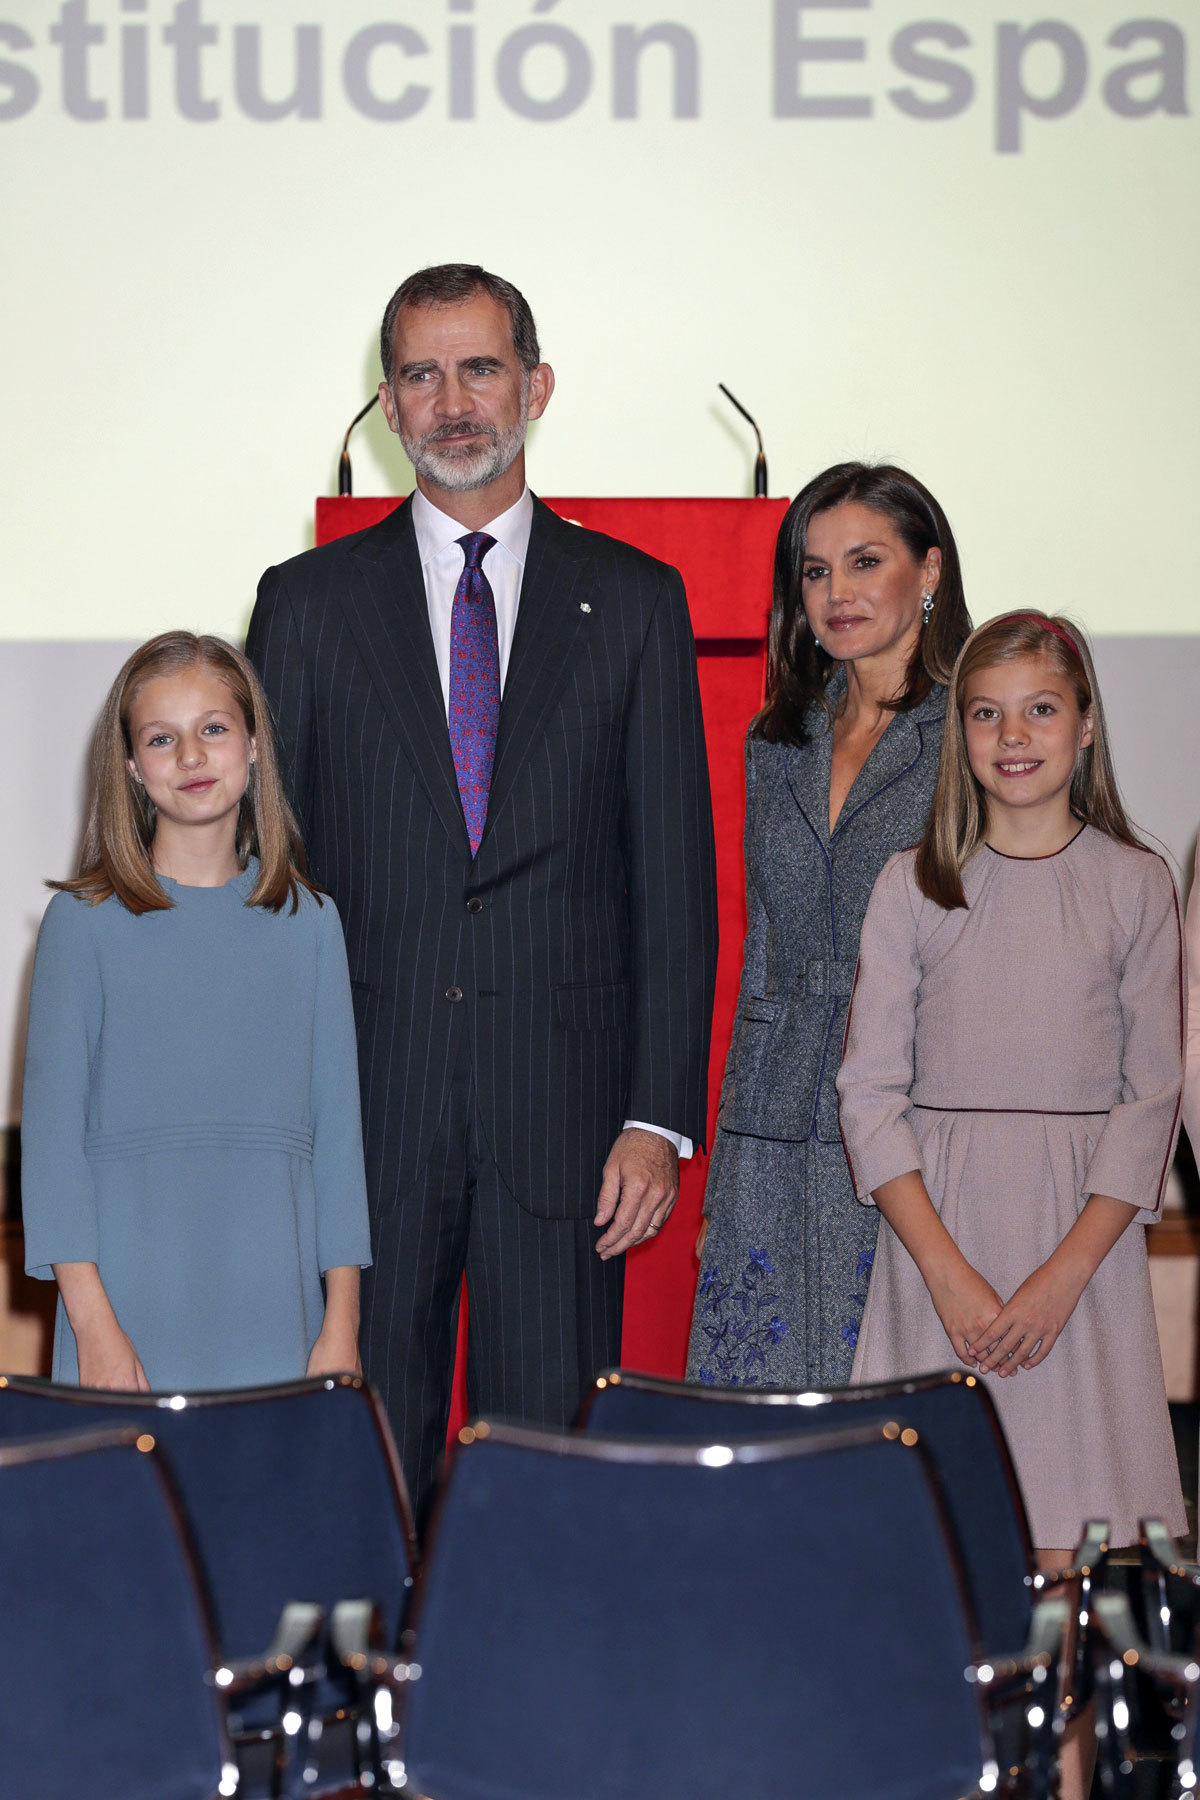 Rey Felipe VI, reina Letizia, Infanta Leonor, Infanta Sofía